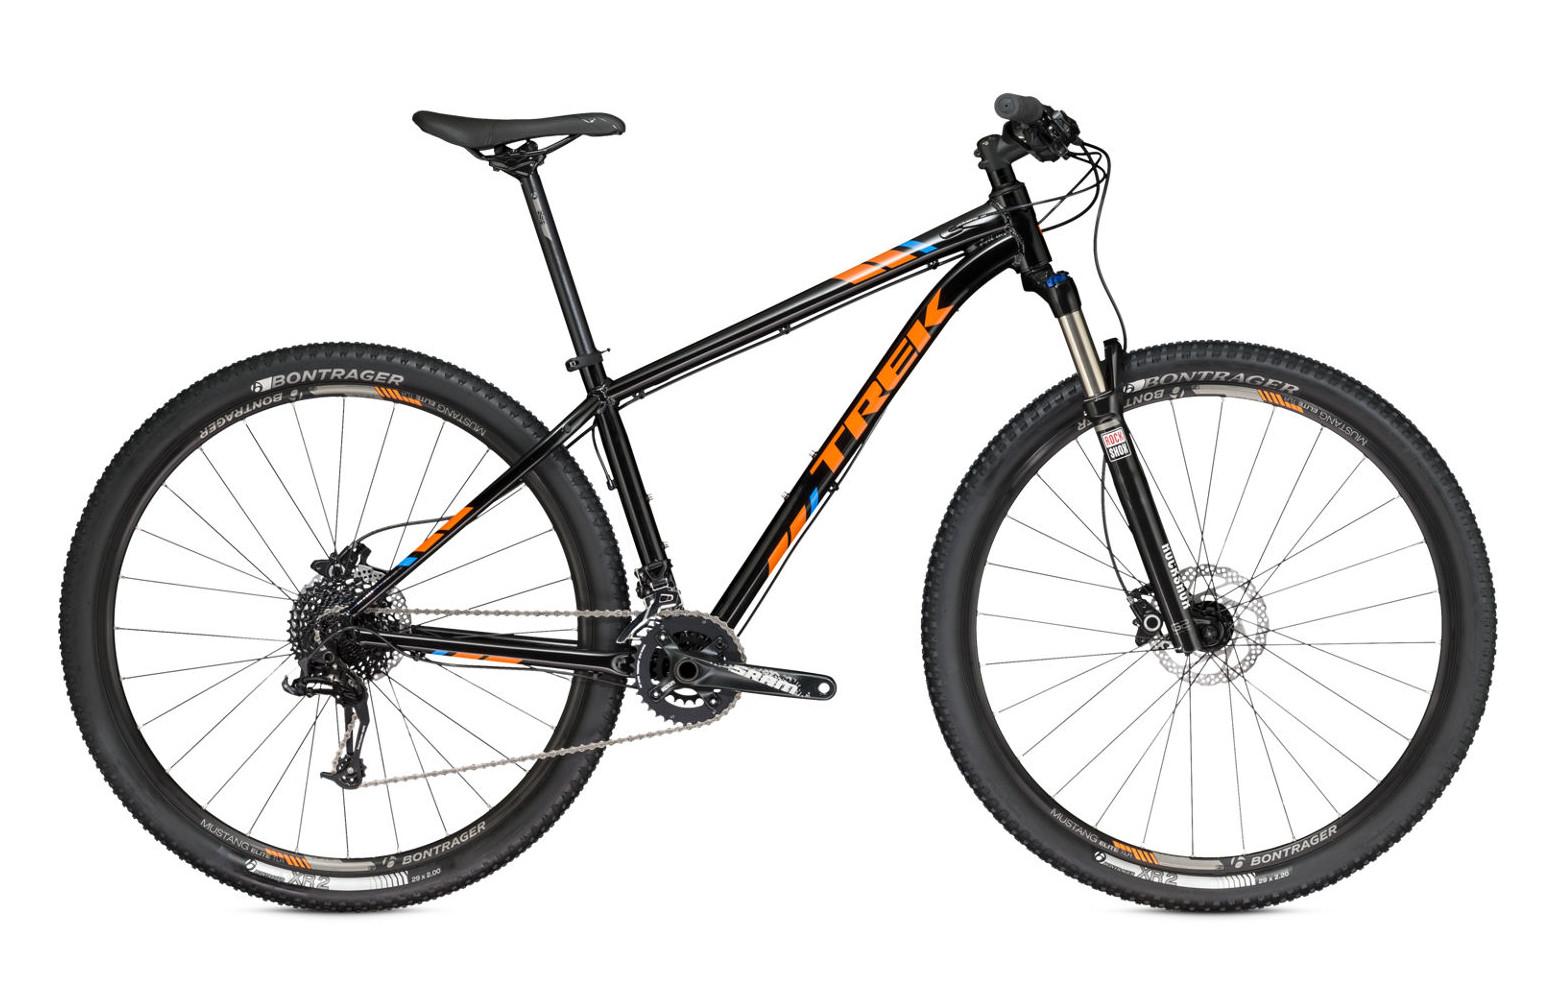 TREK 2016 X-CALIBER 8 29'' Hardtail Bike Black Orange